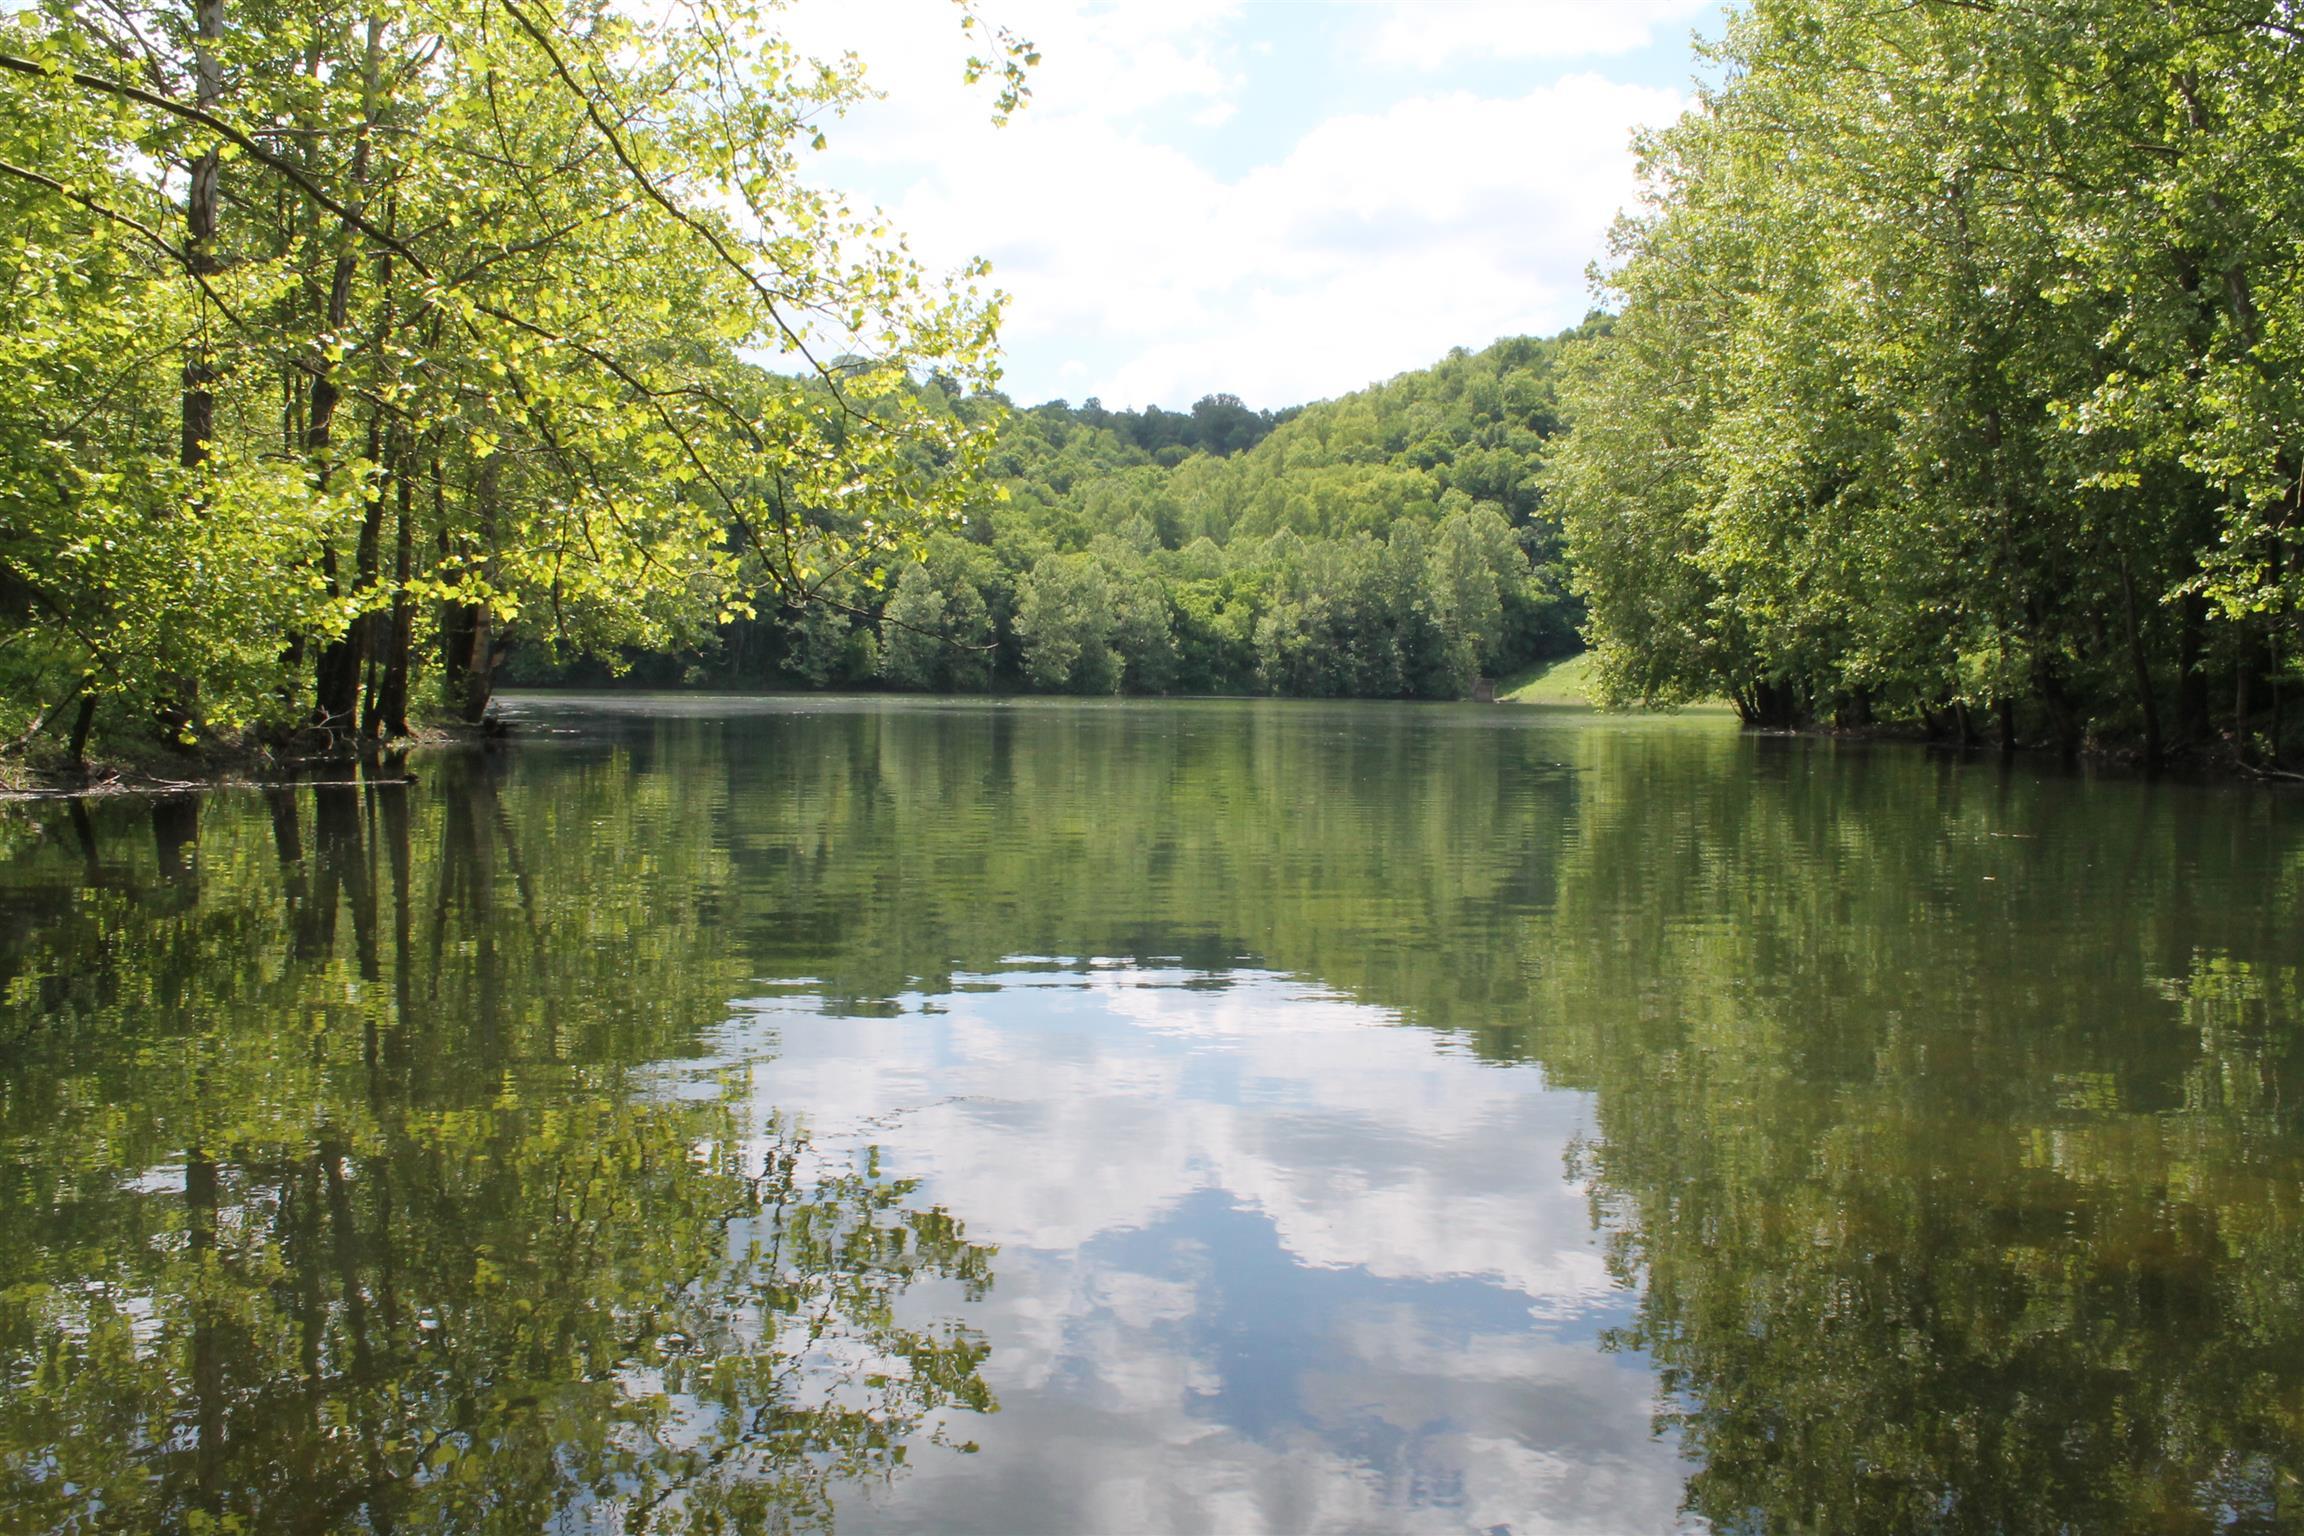 897 Crabtree Creek Rd, Whitleyville, TN 38588 - Whitleyville, TN real estate listing